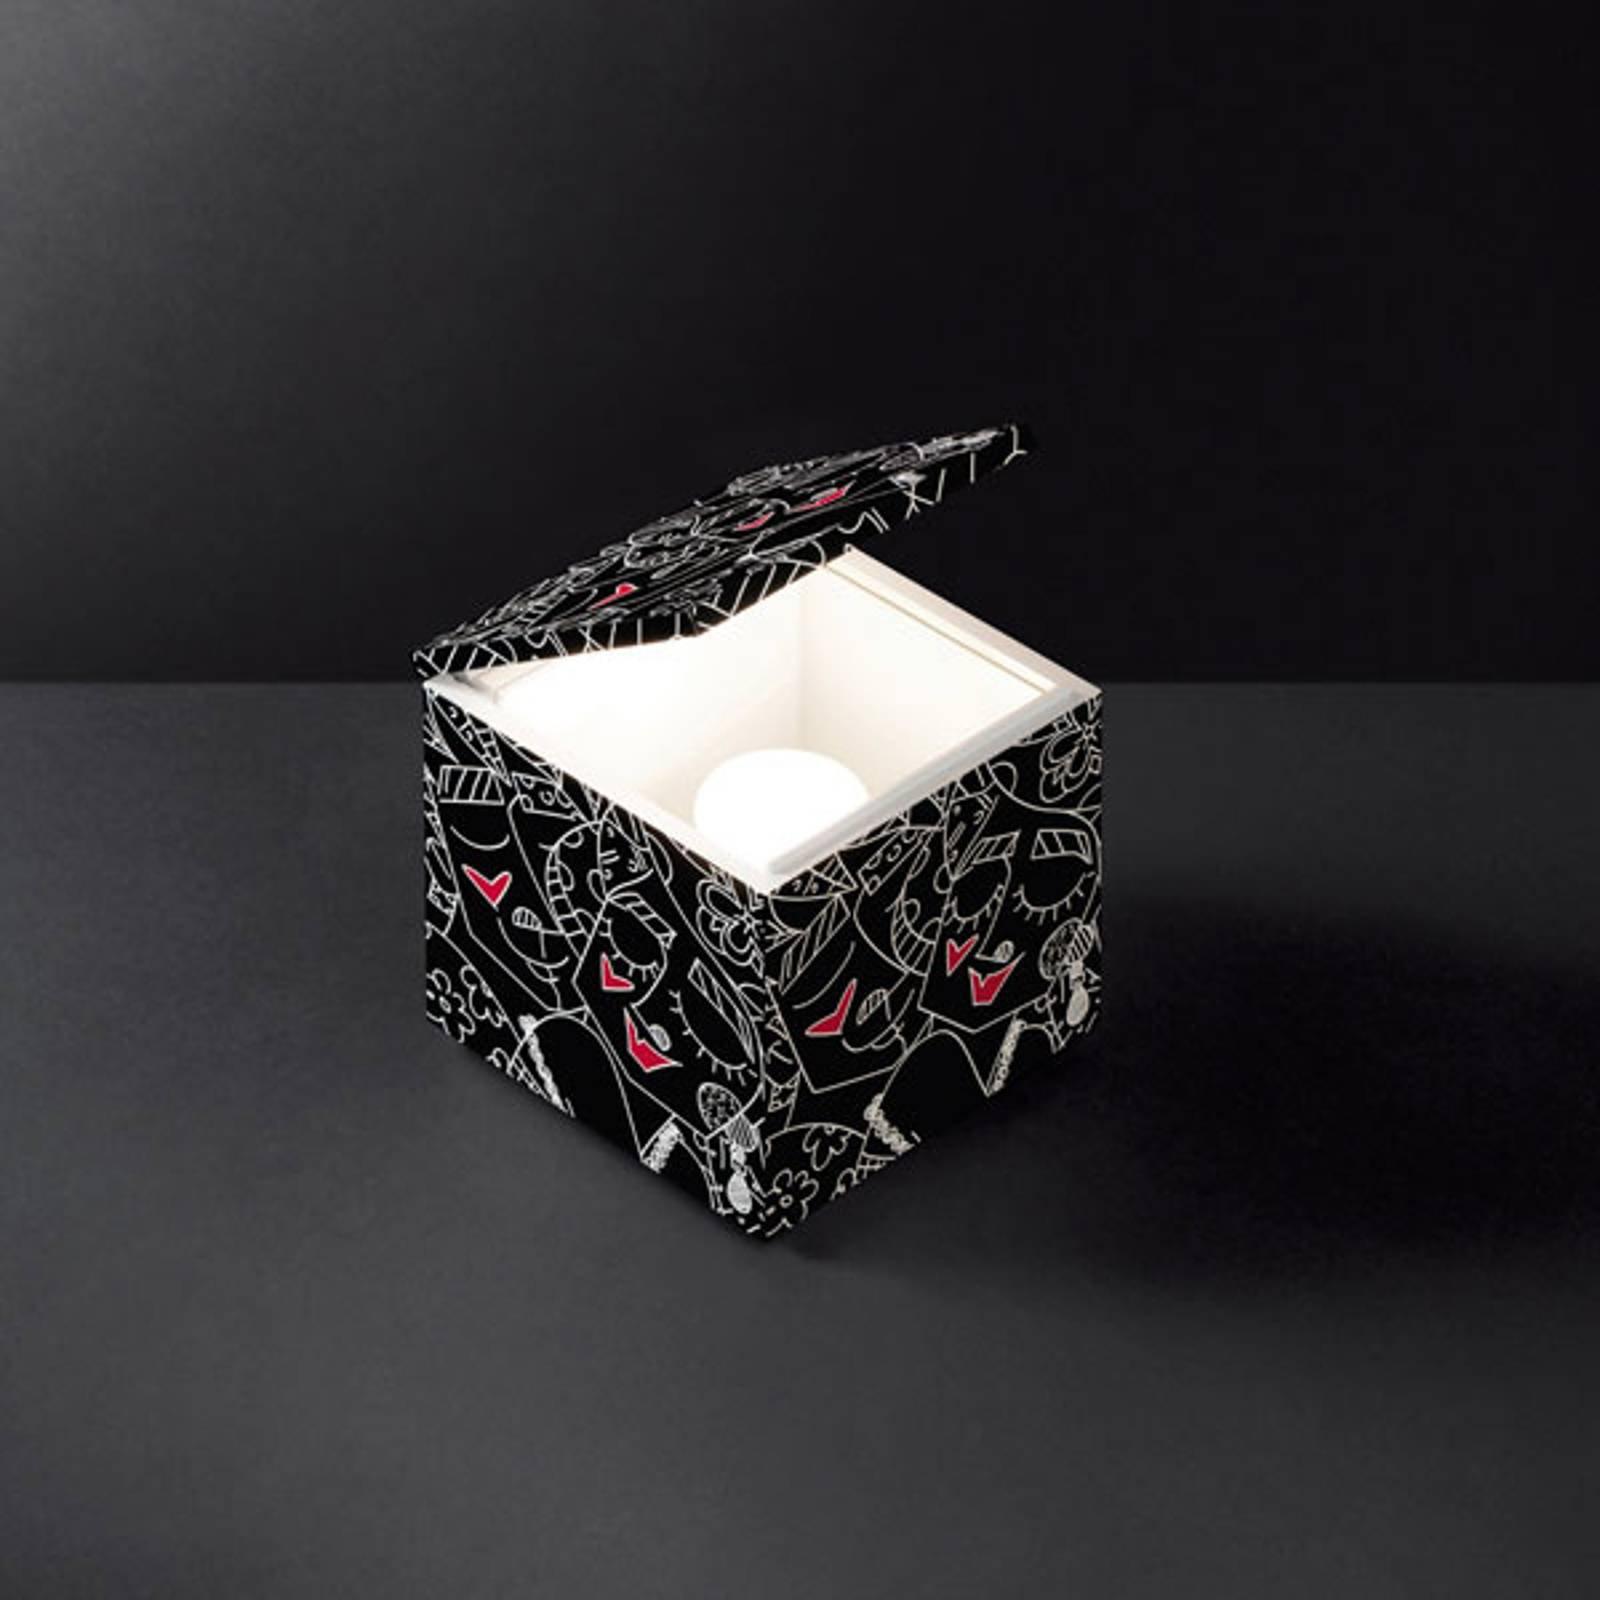 Cini&Nils Cuboluce LED-bordlampe Britto black